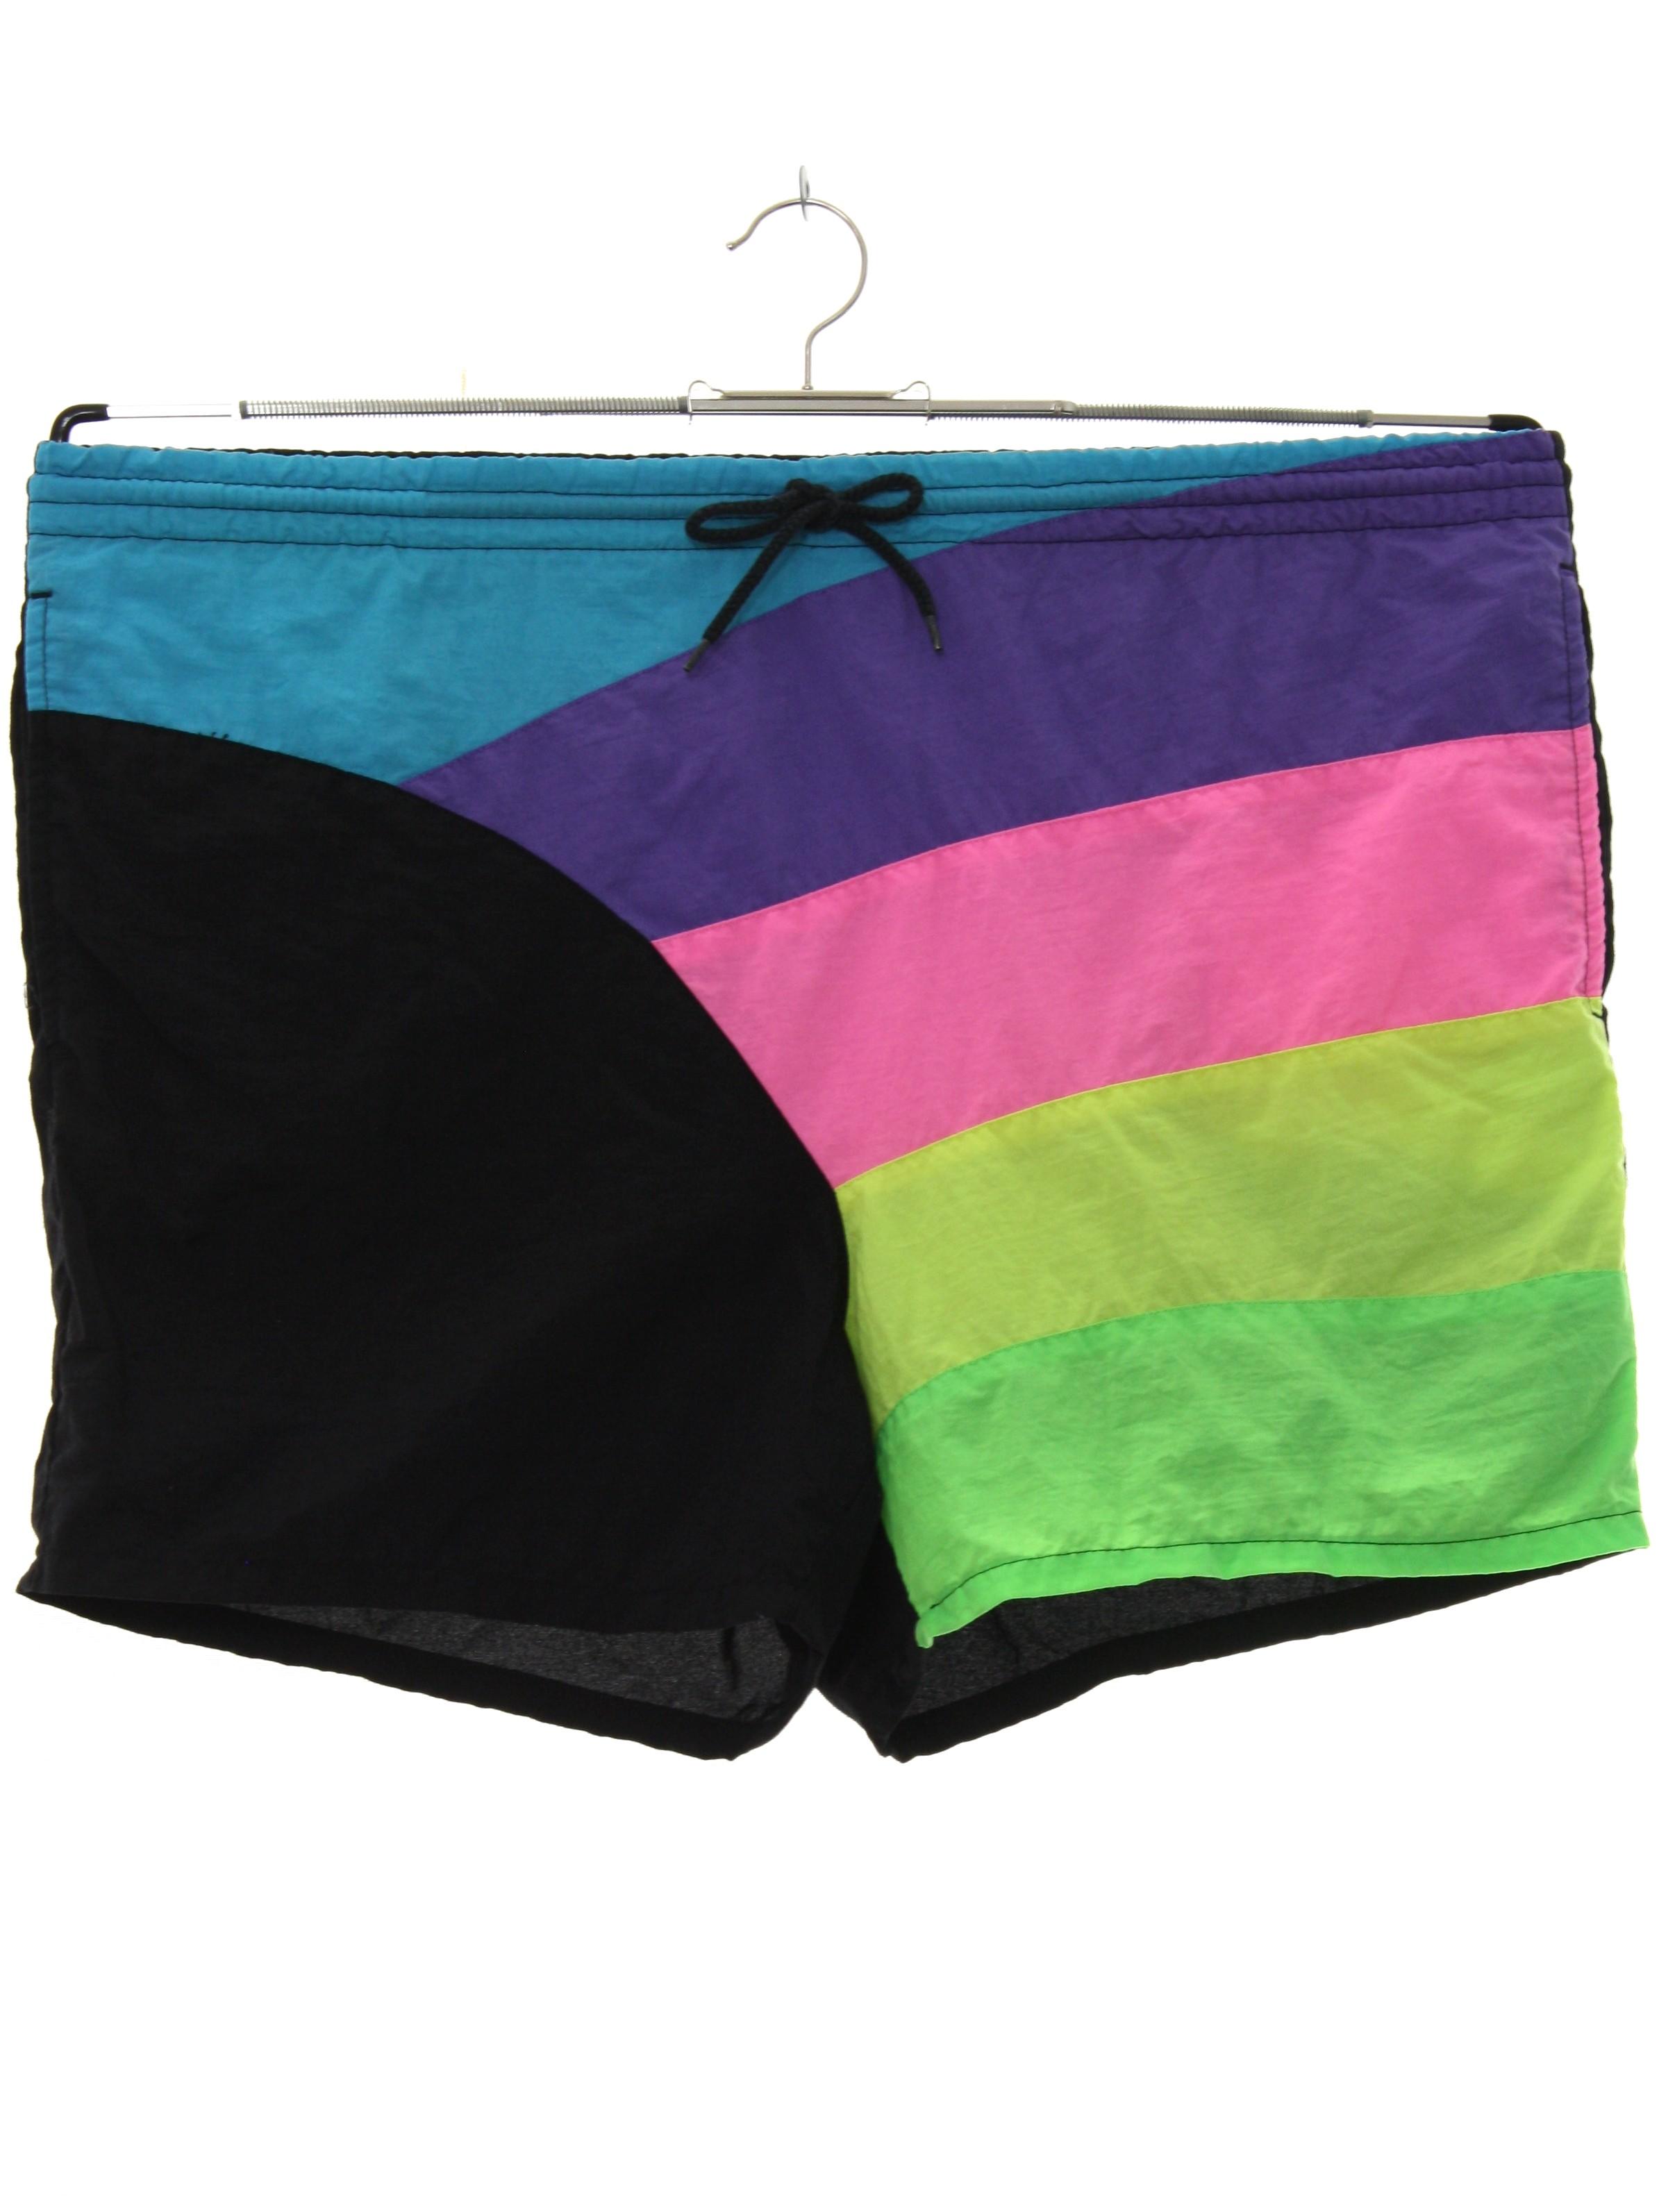 b9b4d9649d9 Swimsuit/Swimwear: (made in 90s) -Dash to the Beach- Mens bright ...